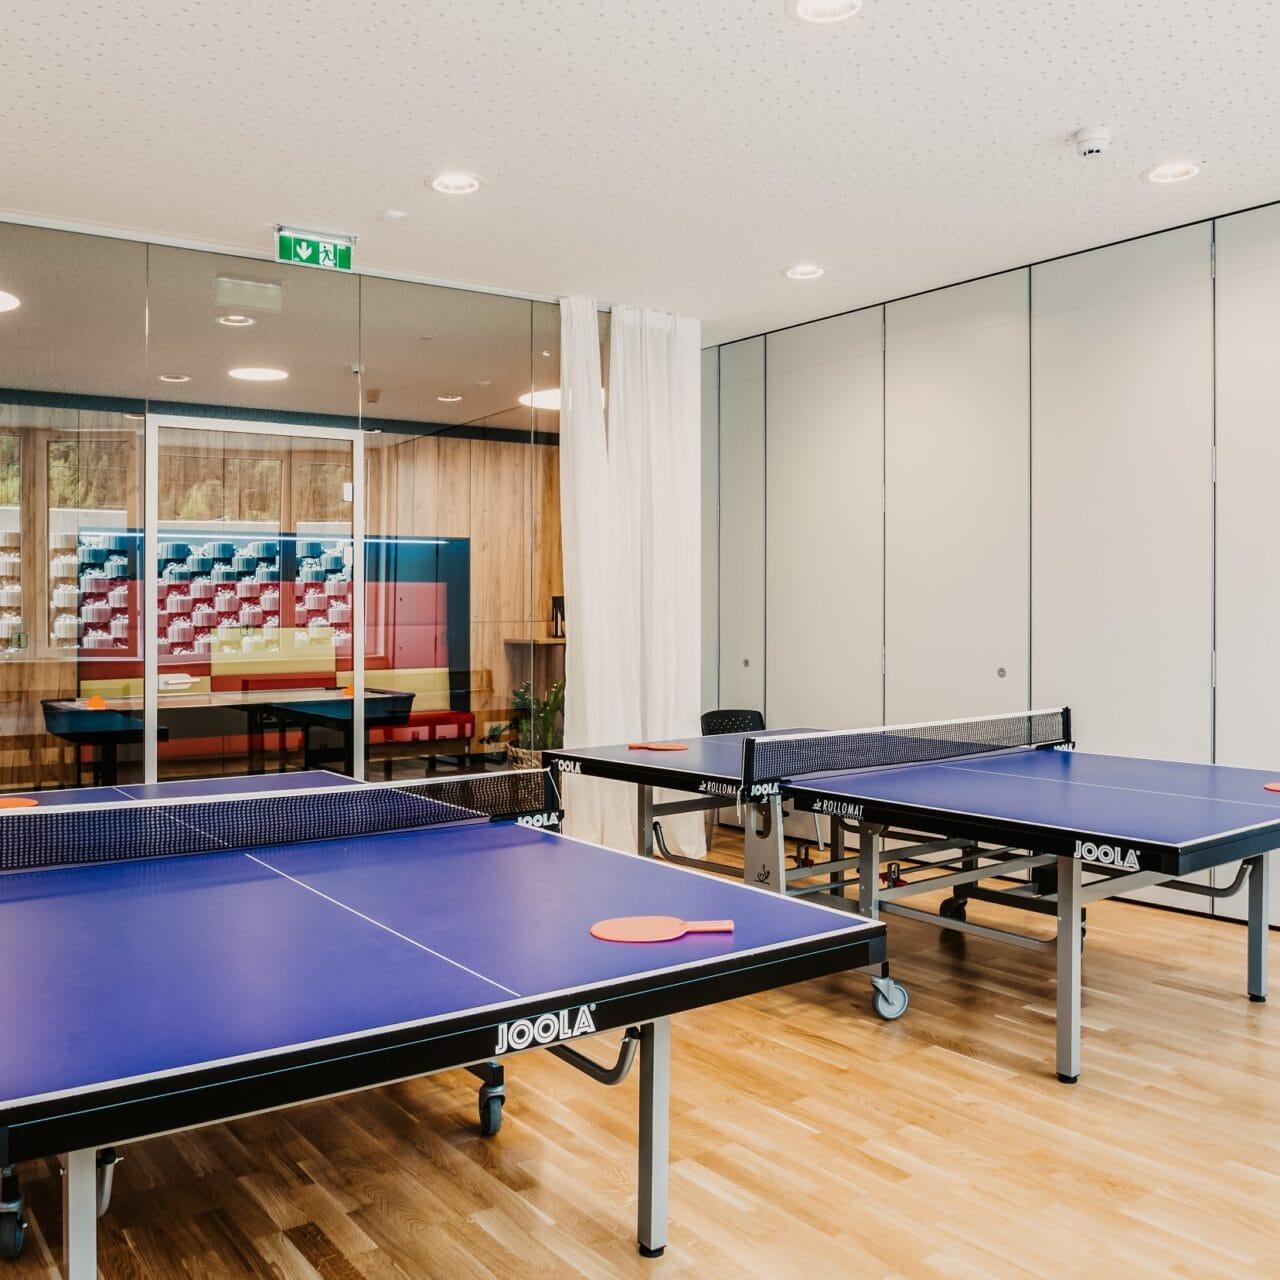 hofgut-apartment-lifestyle-resort-erlebenimhofgut-tischtennis